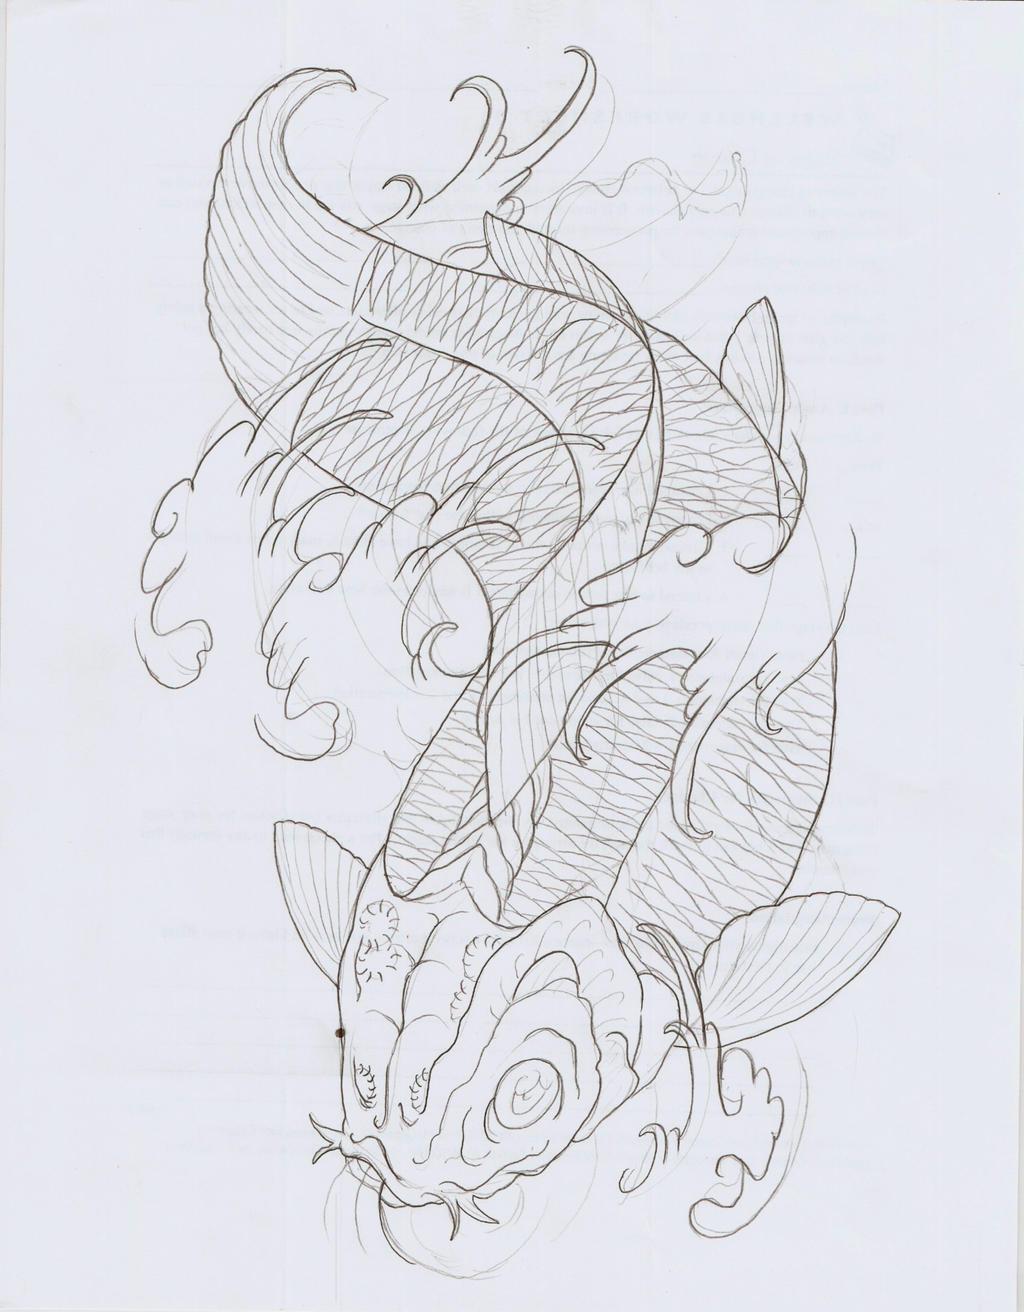 Koi fish xi outline by eltri on deviantart for Large coy fish